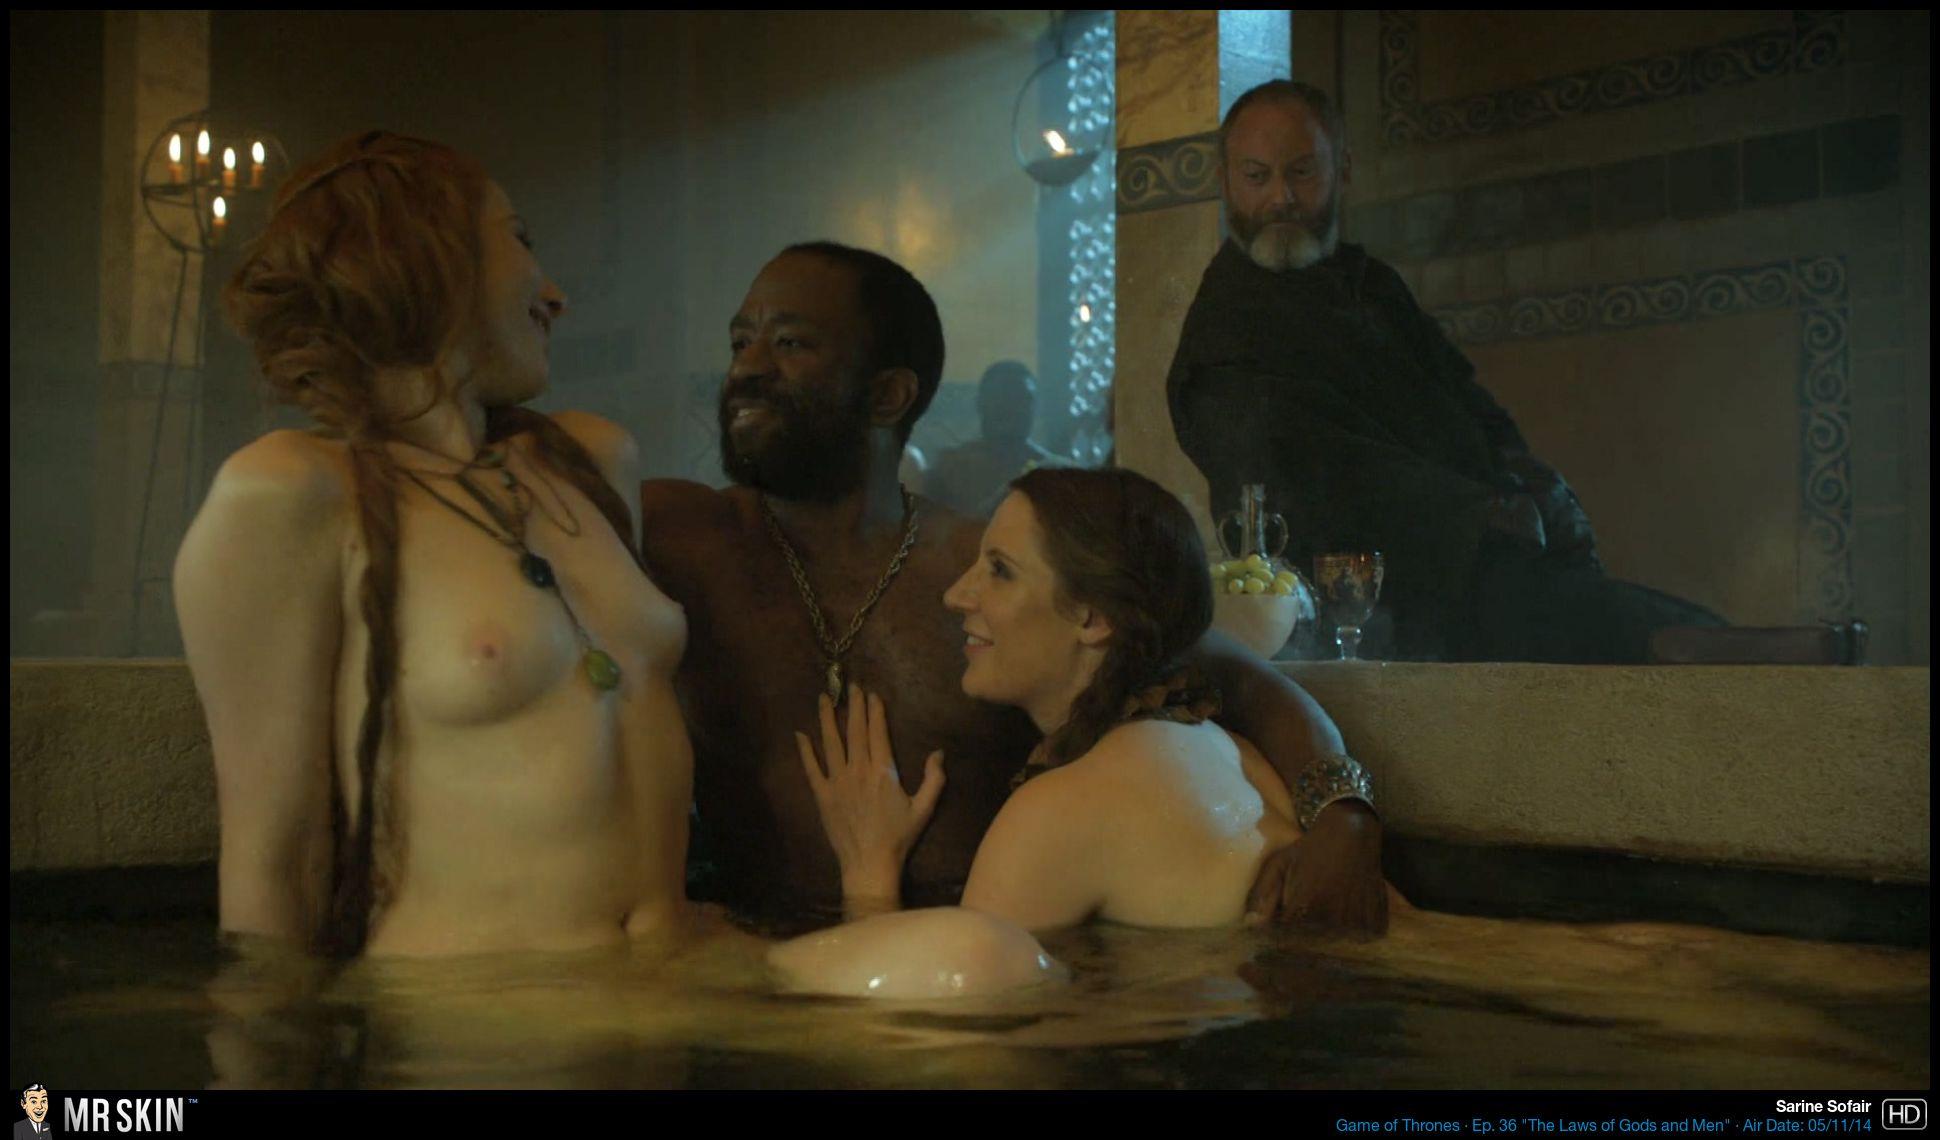 prostitutas lujo famosas prostitutas juego de tronos